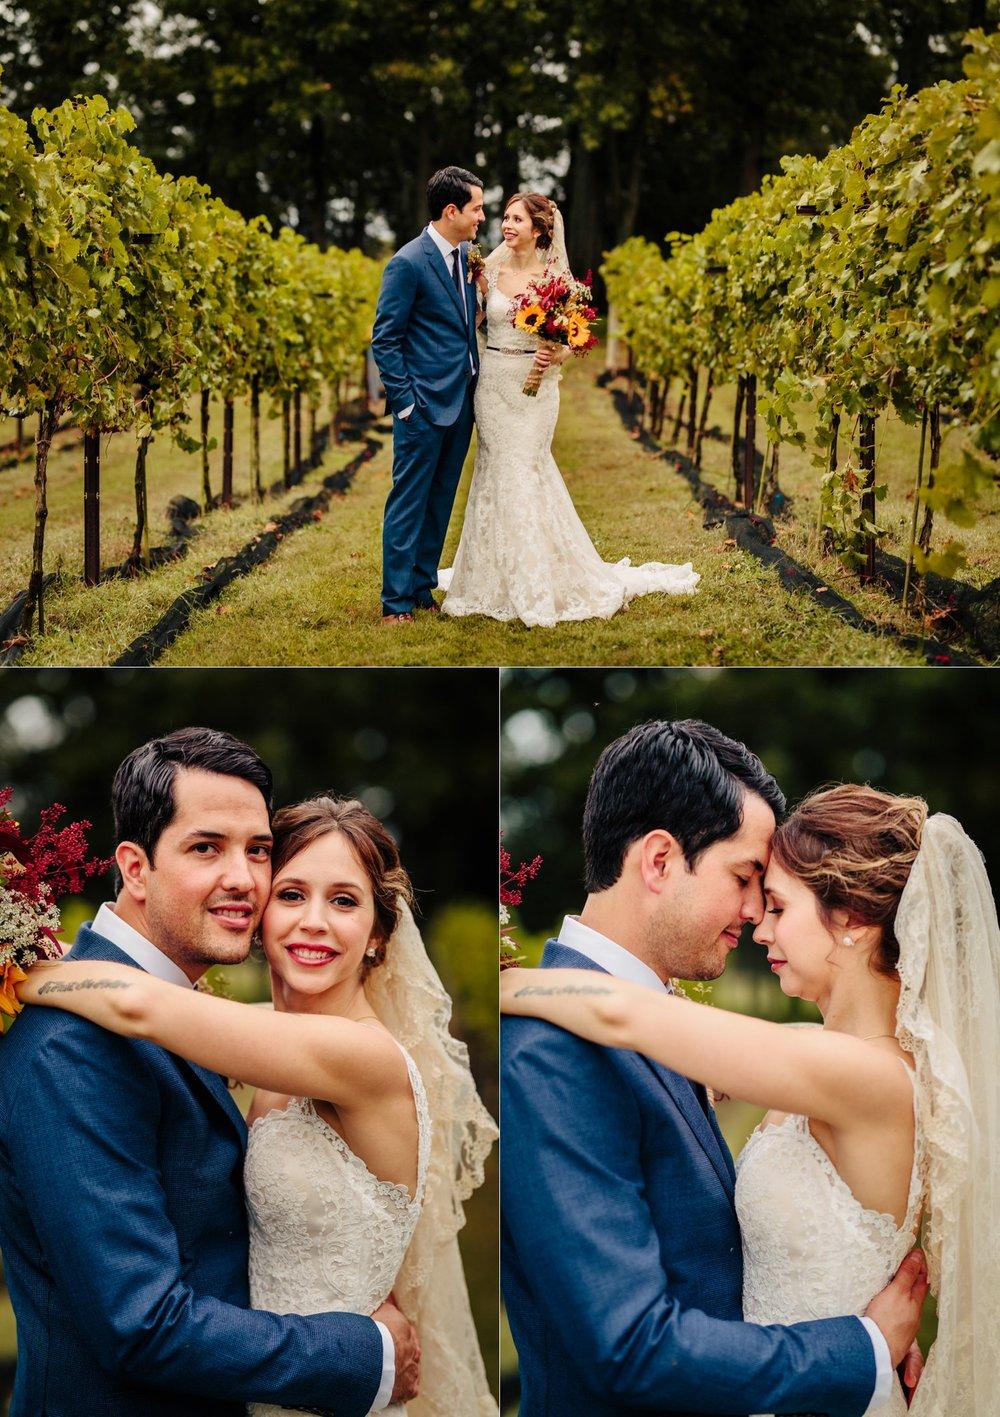 CK-Photo-arrington-wedding_0020.jpg